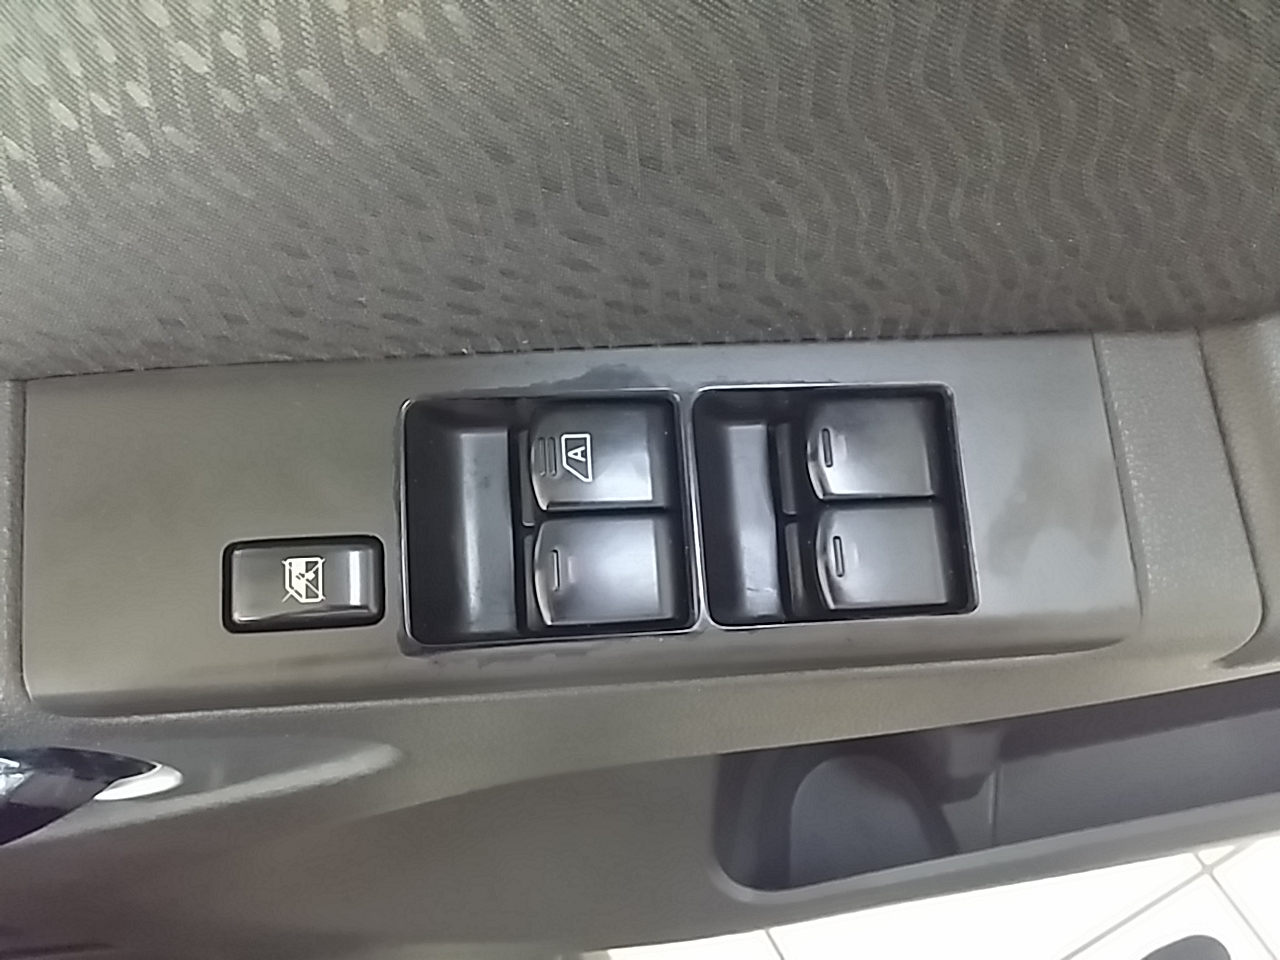 Nissan Navara 2.5 Dci Le 4x4 A/t P/u D/c